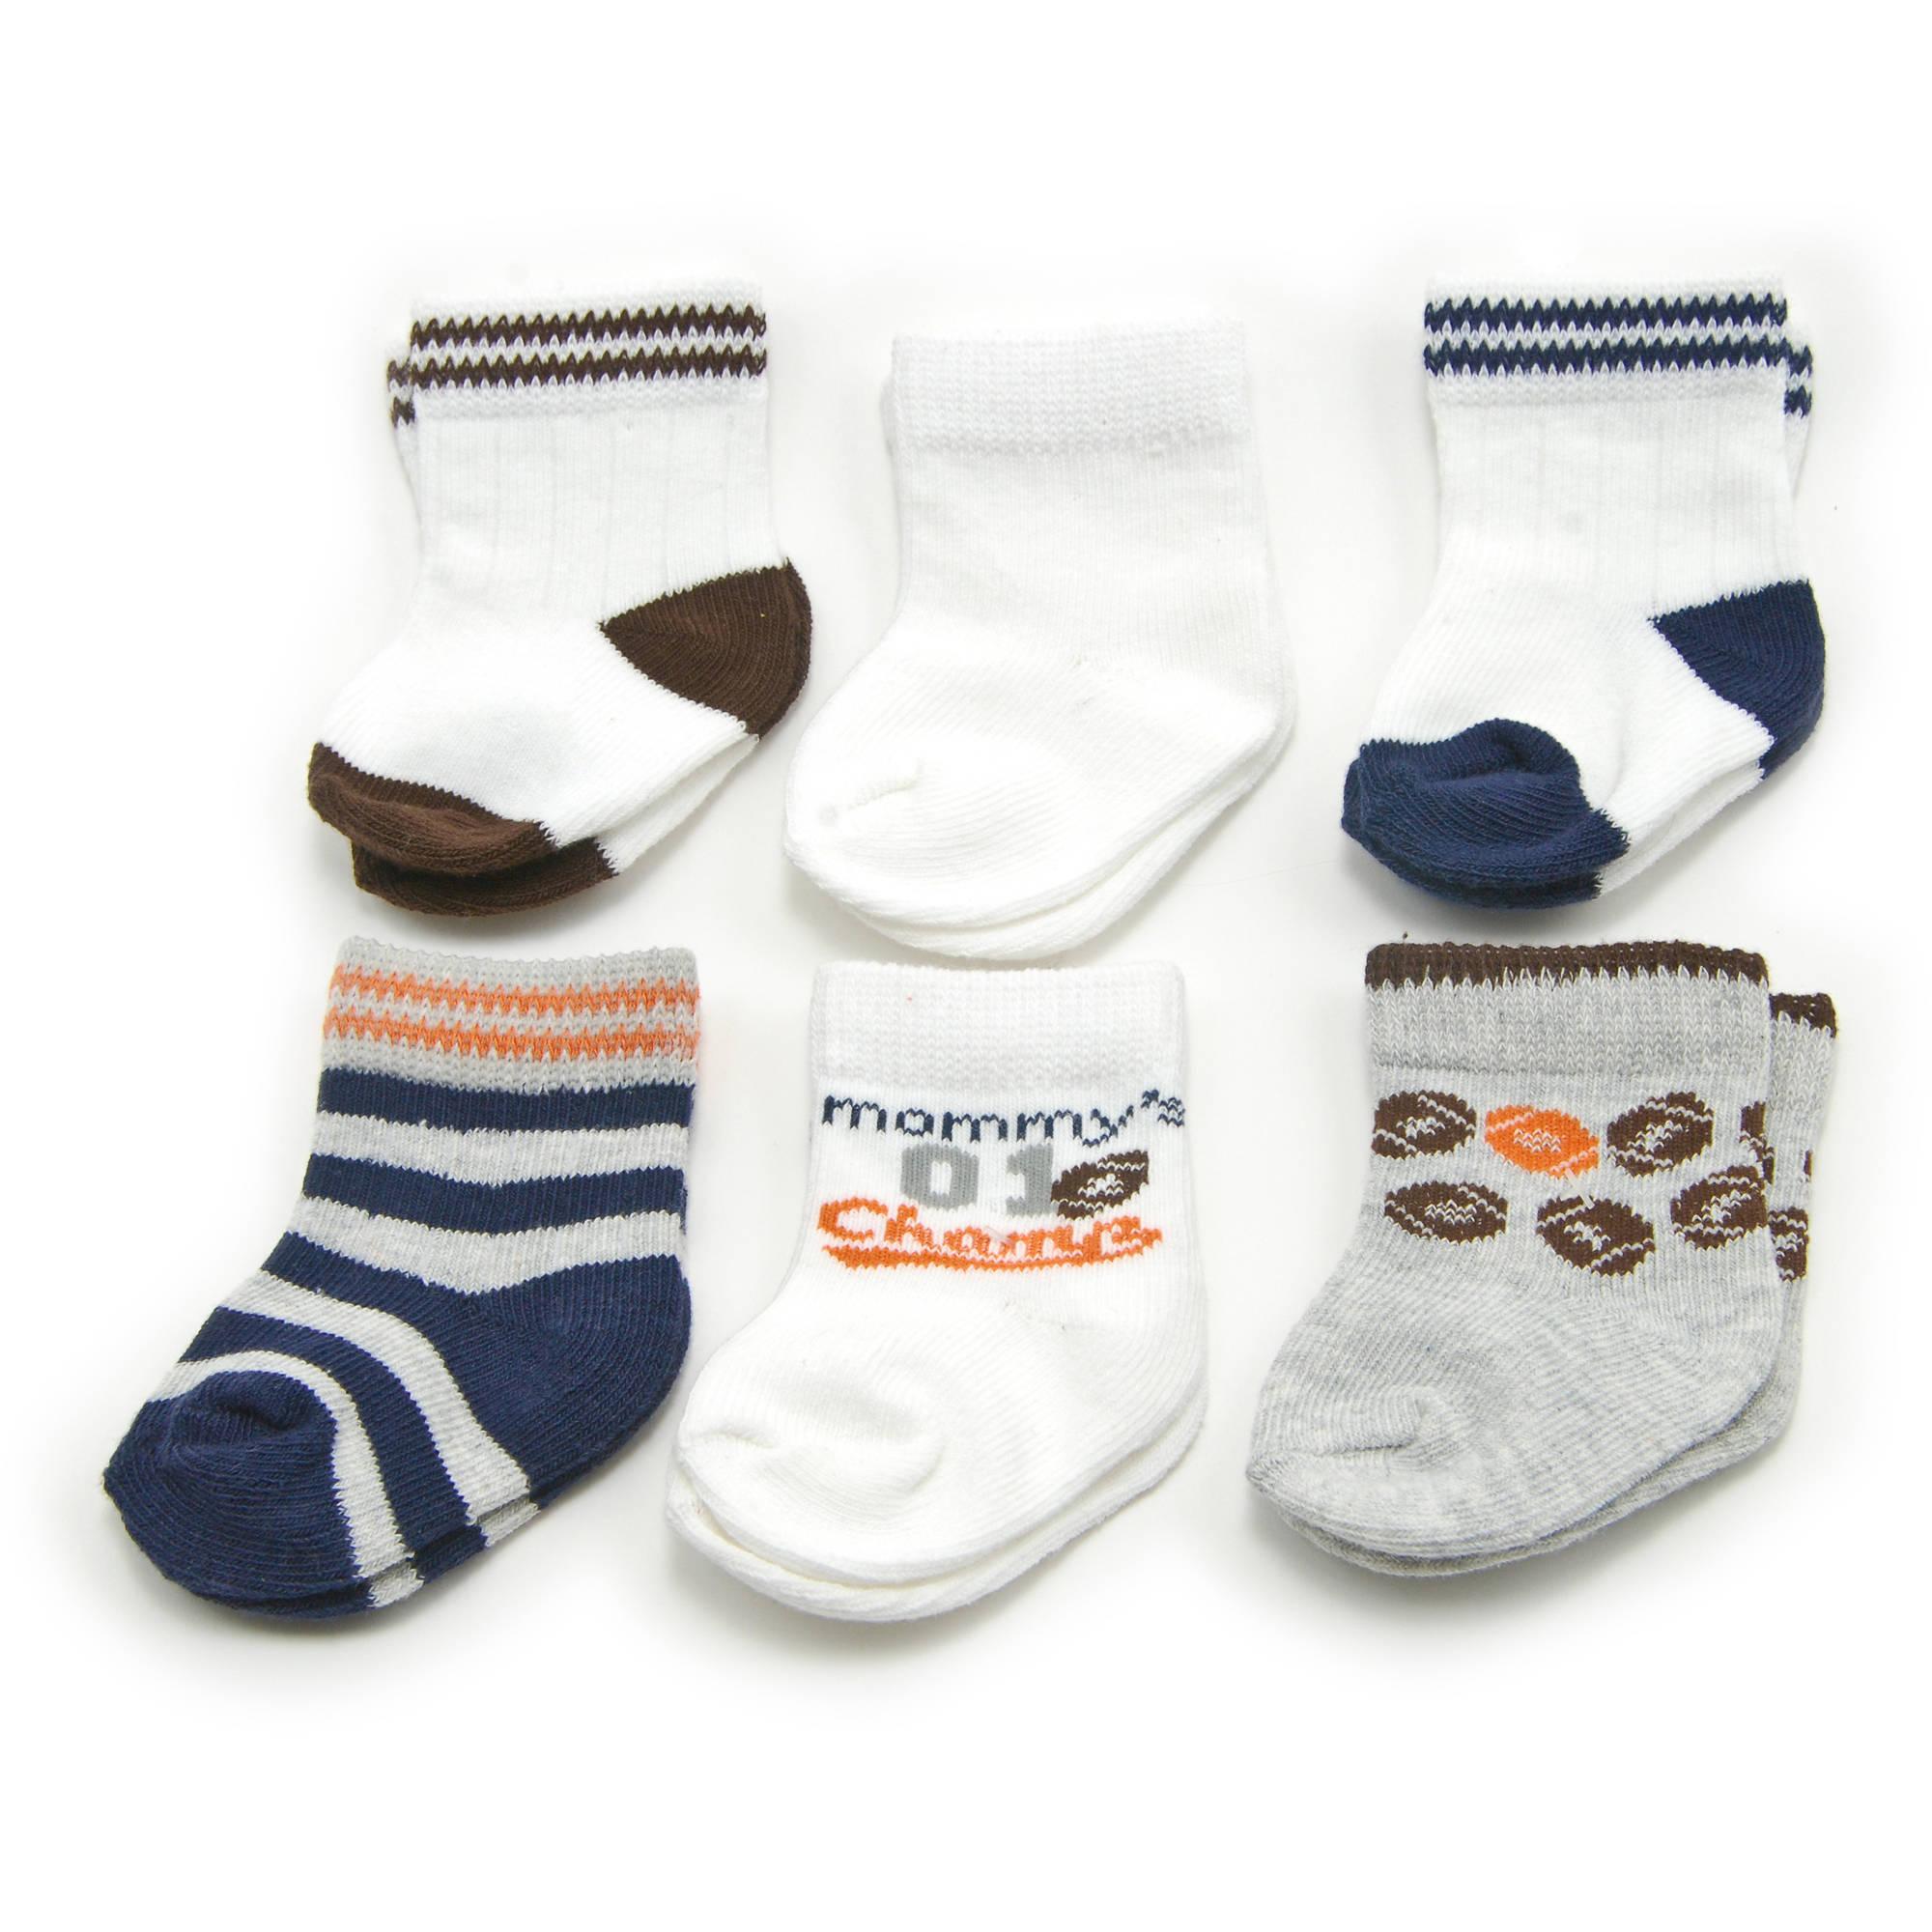 Child of Mine Baby Boys' Graphic Fashion Socks, 6-Pack